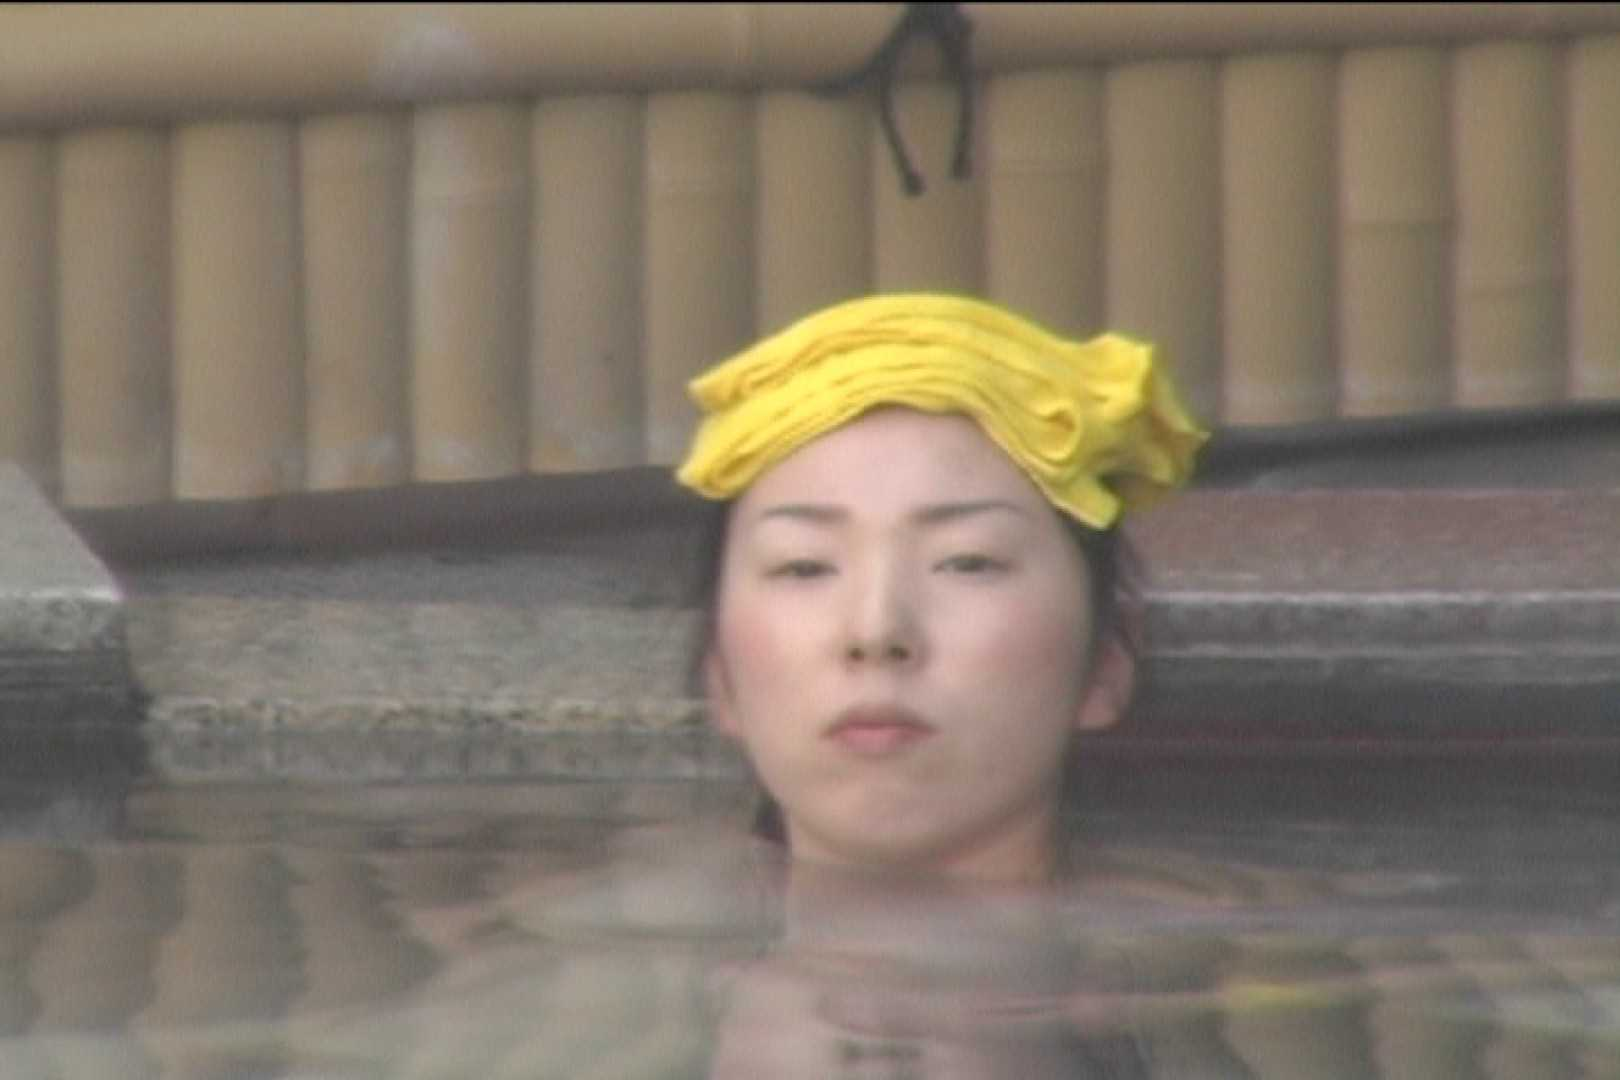 Aquaな露天風呂Vol.529 盗撮映像  51Pix 8